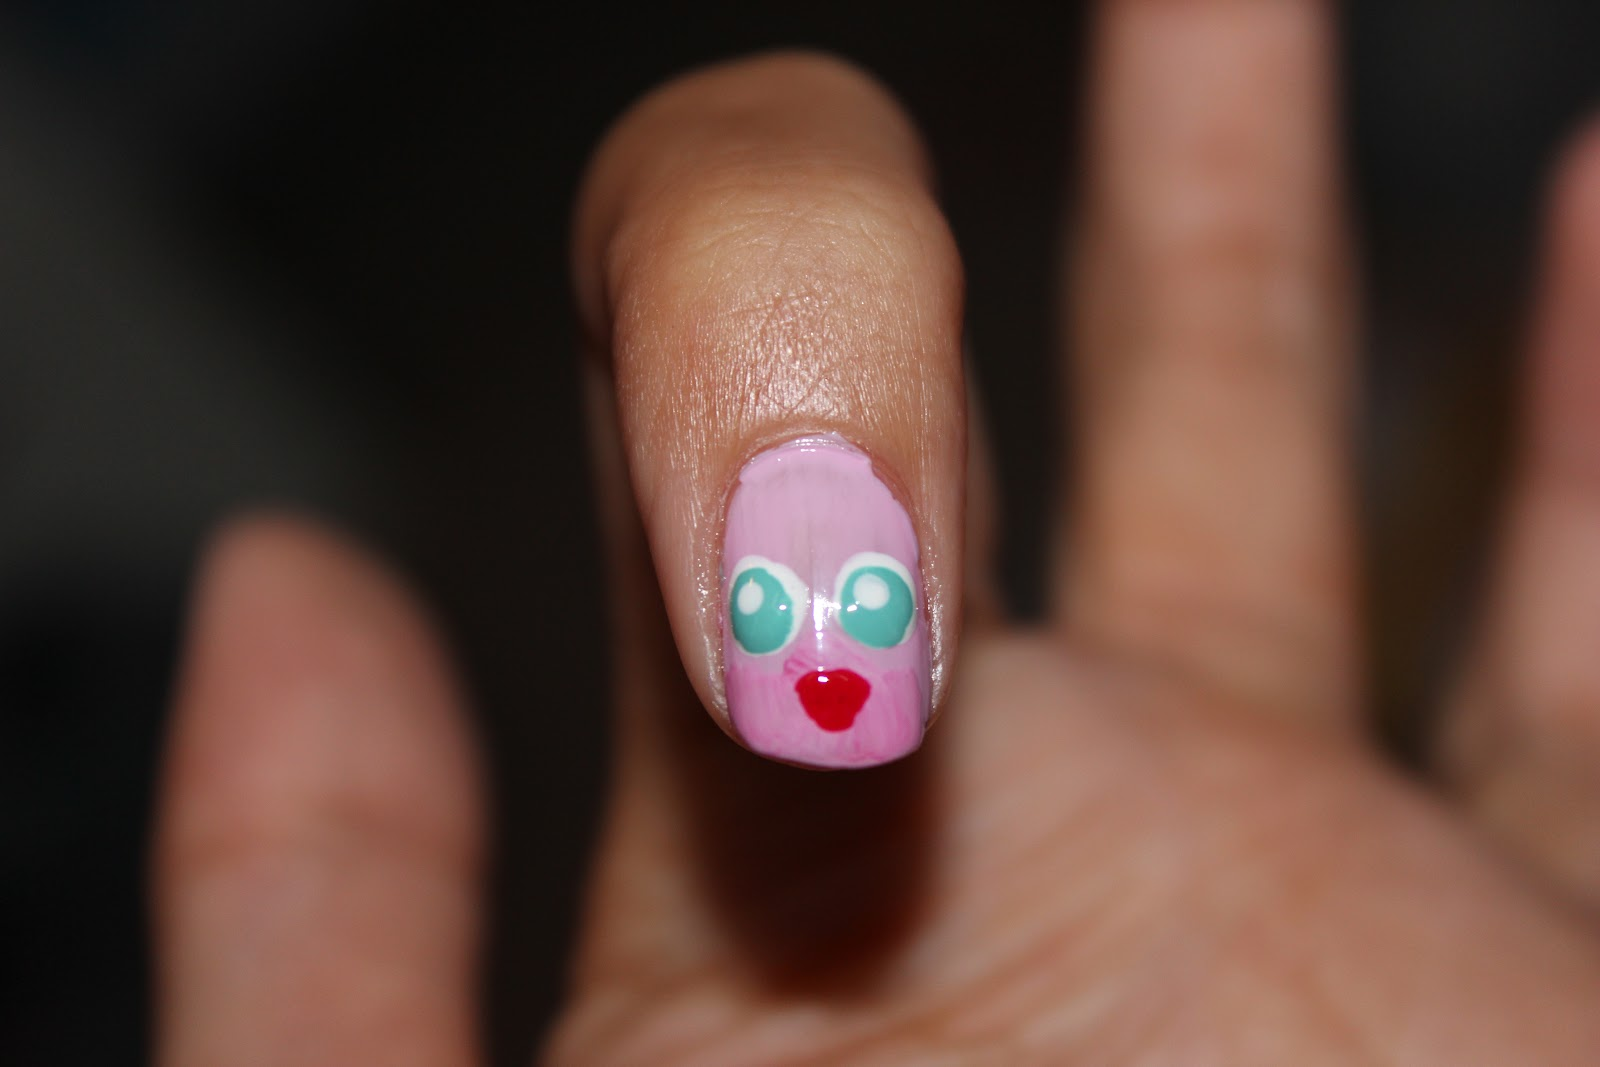 Old to Bold: 11. Jigglypuff Nail Art